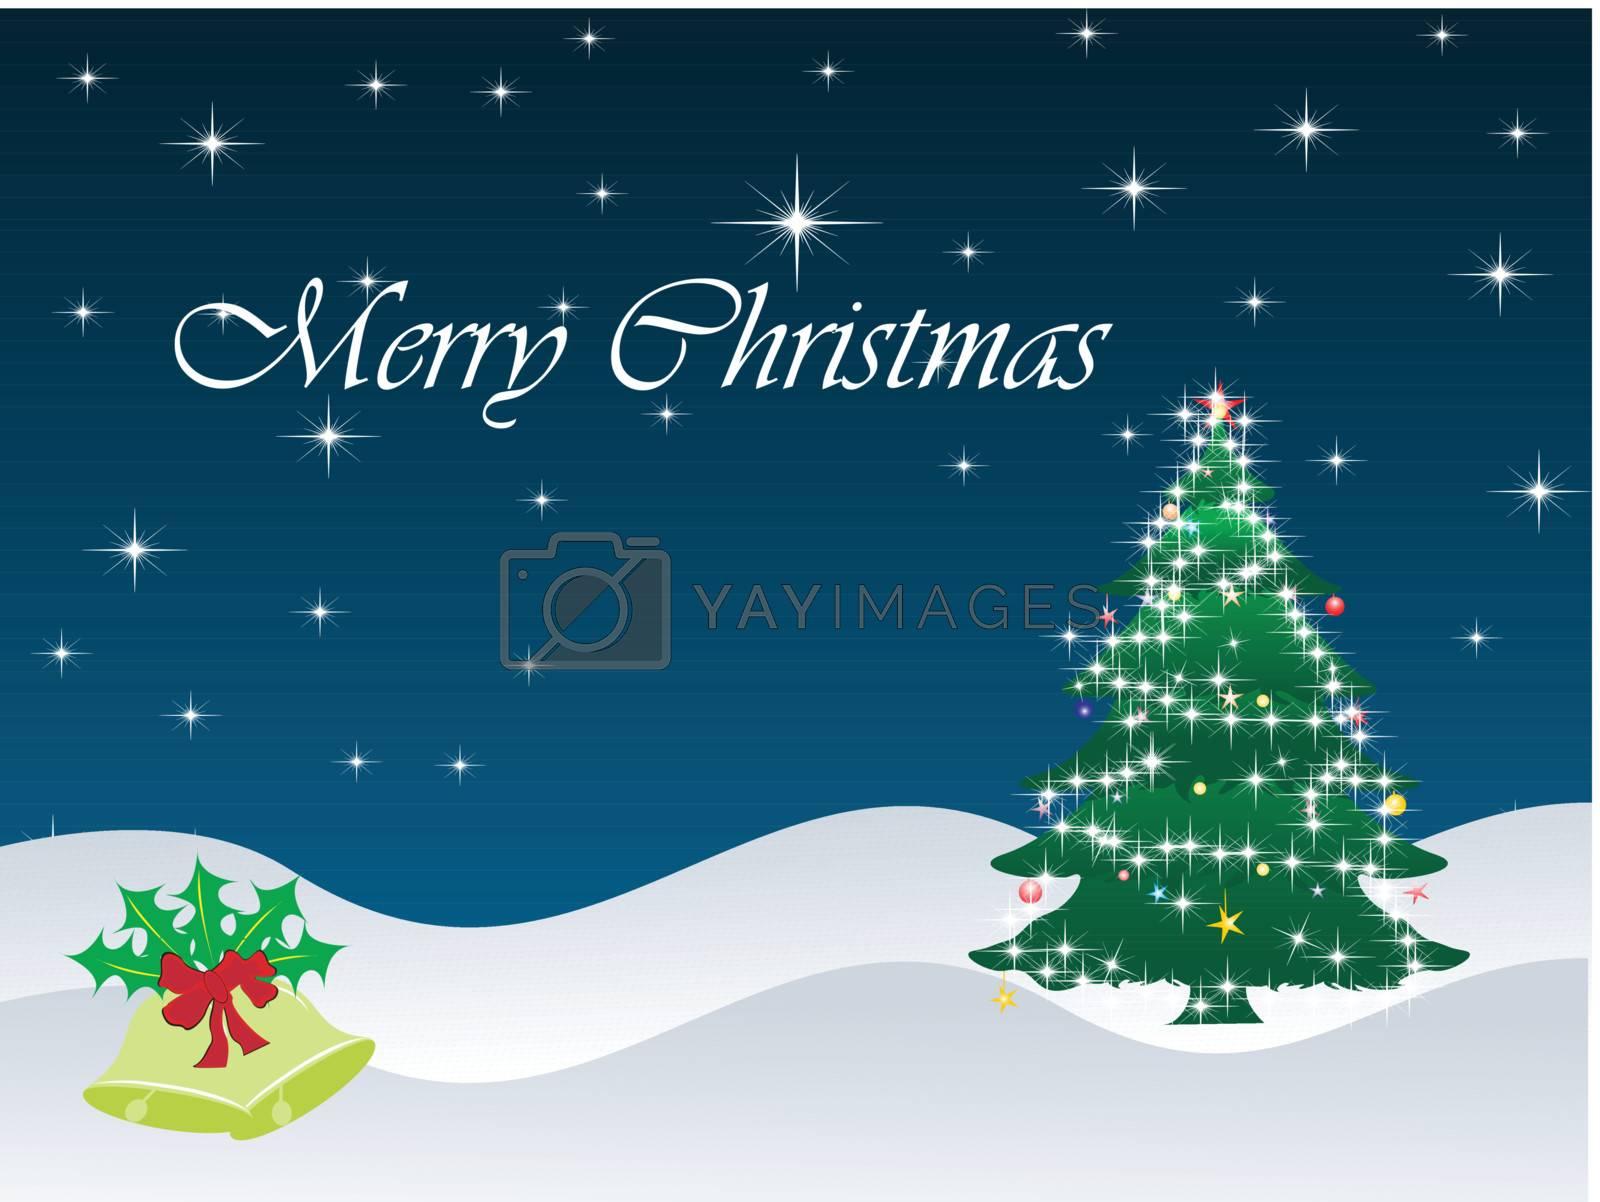 christmas snowflake, bell, tree element for design, vector illustration